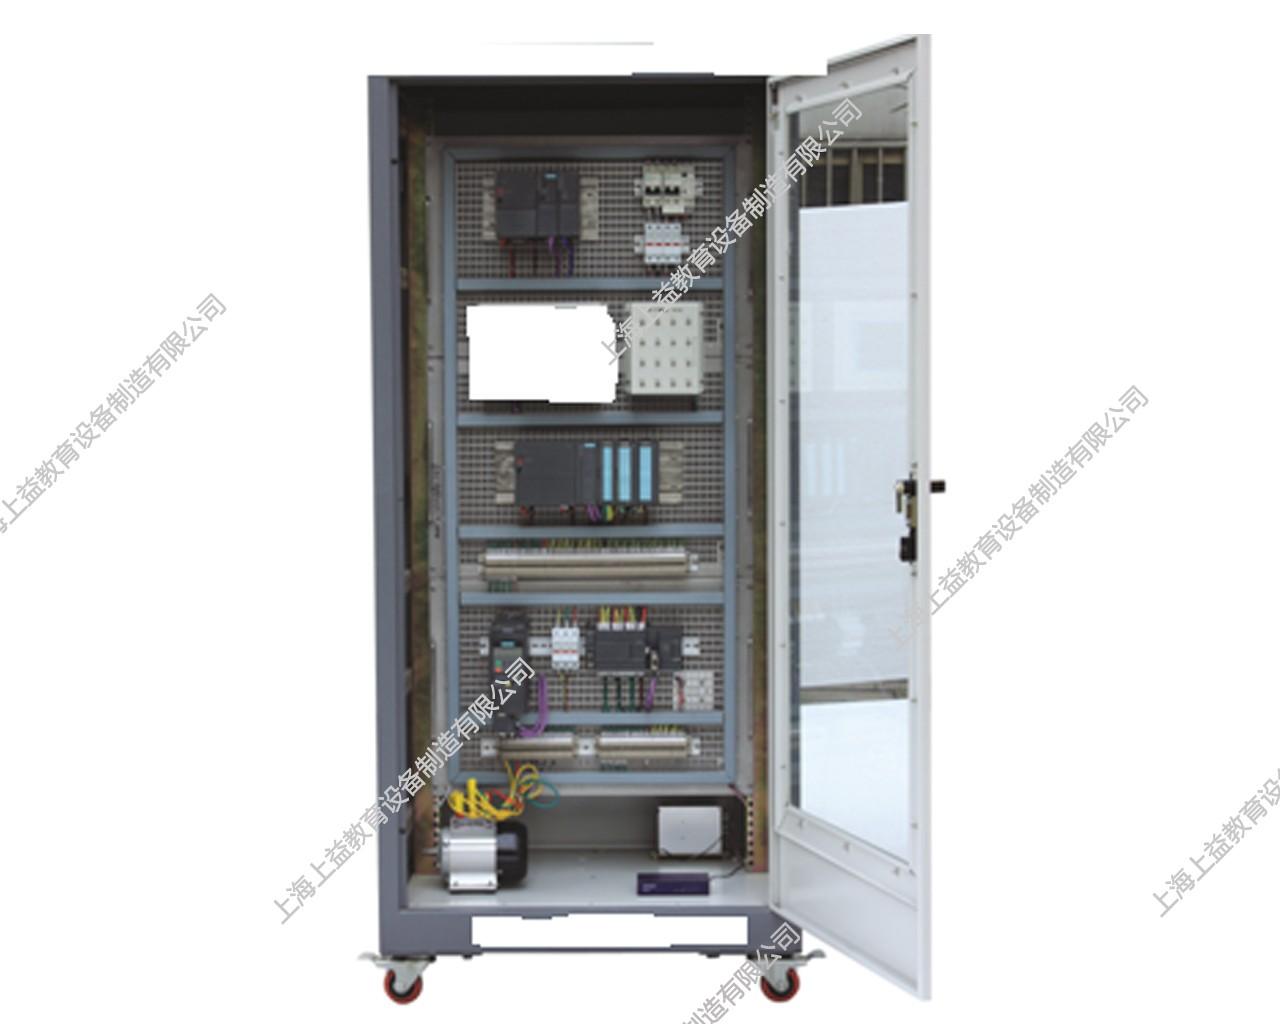 SYSZT-05工业自动化通讯网络wwwlehu8vip装置